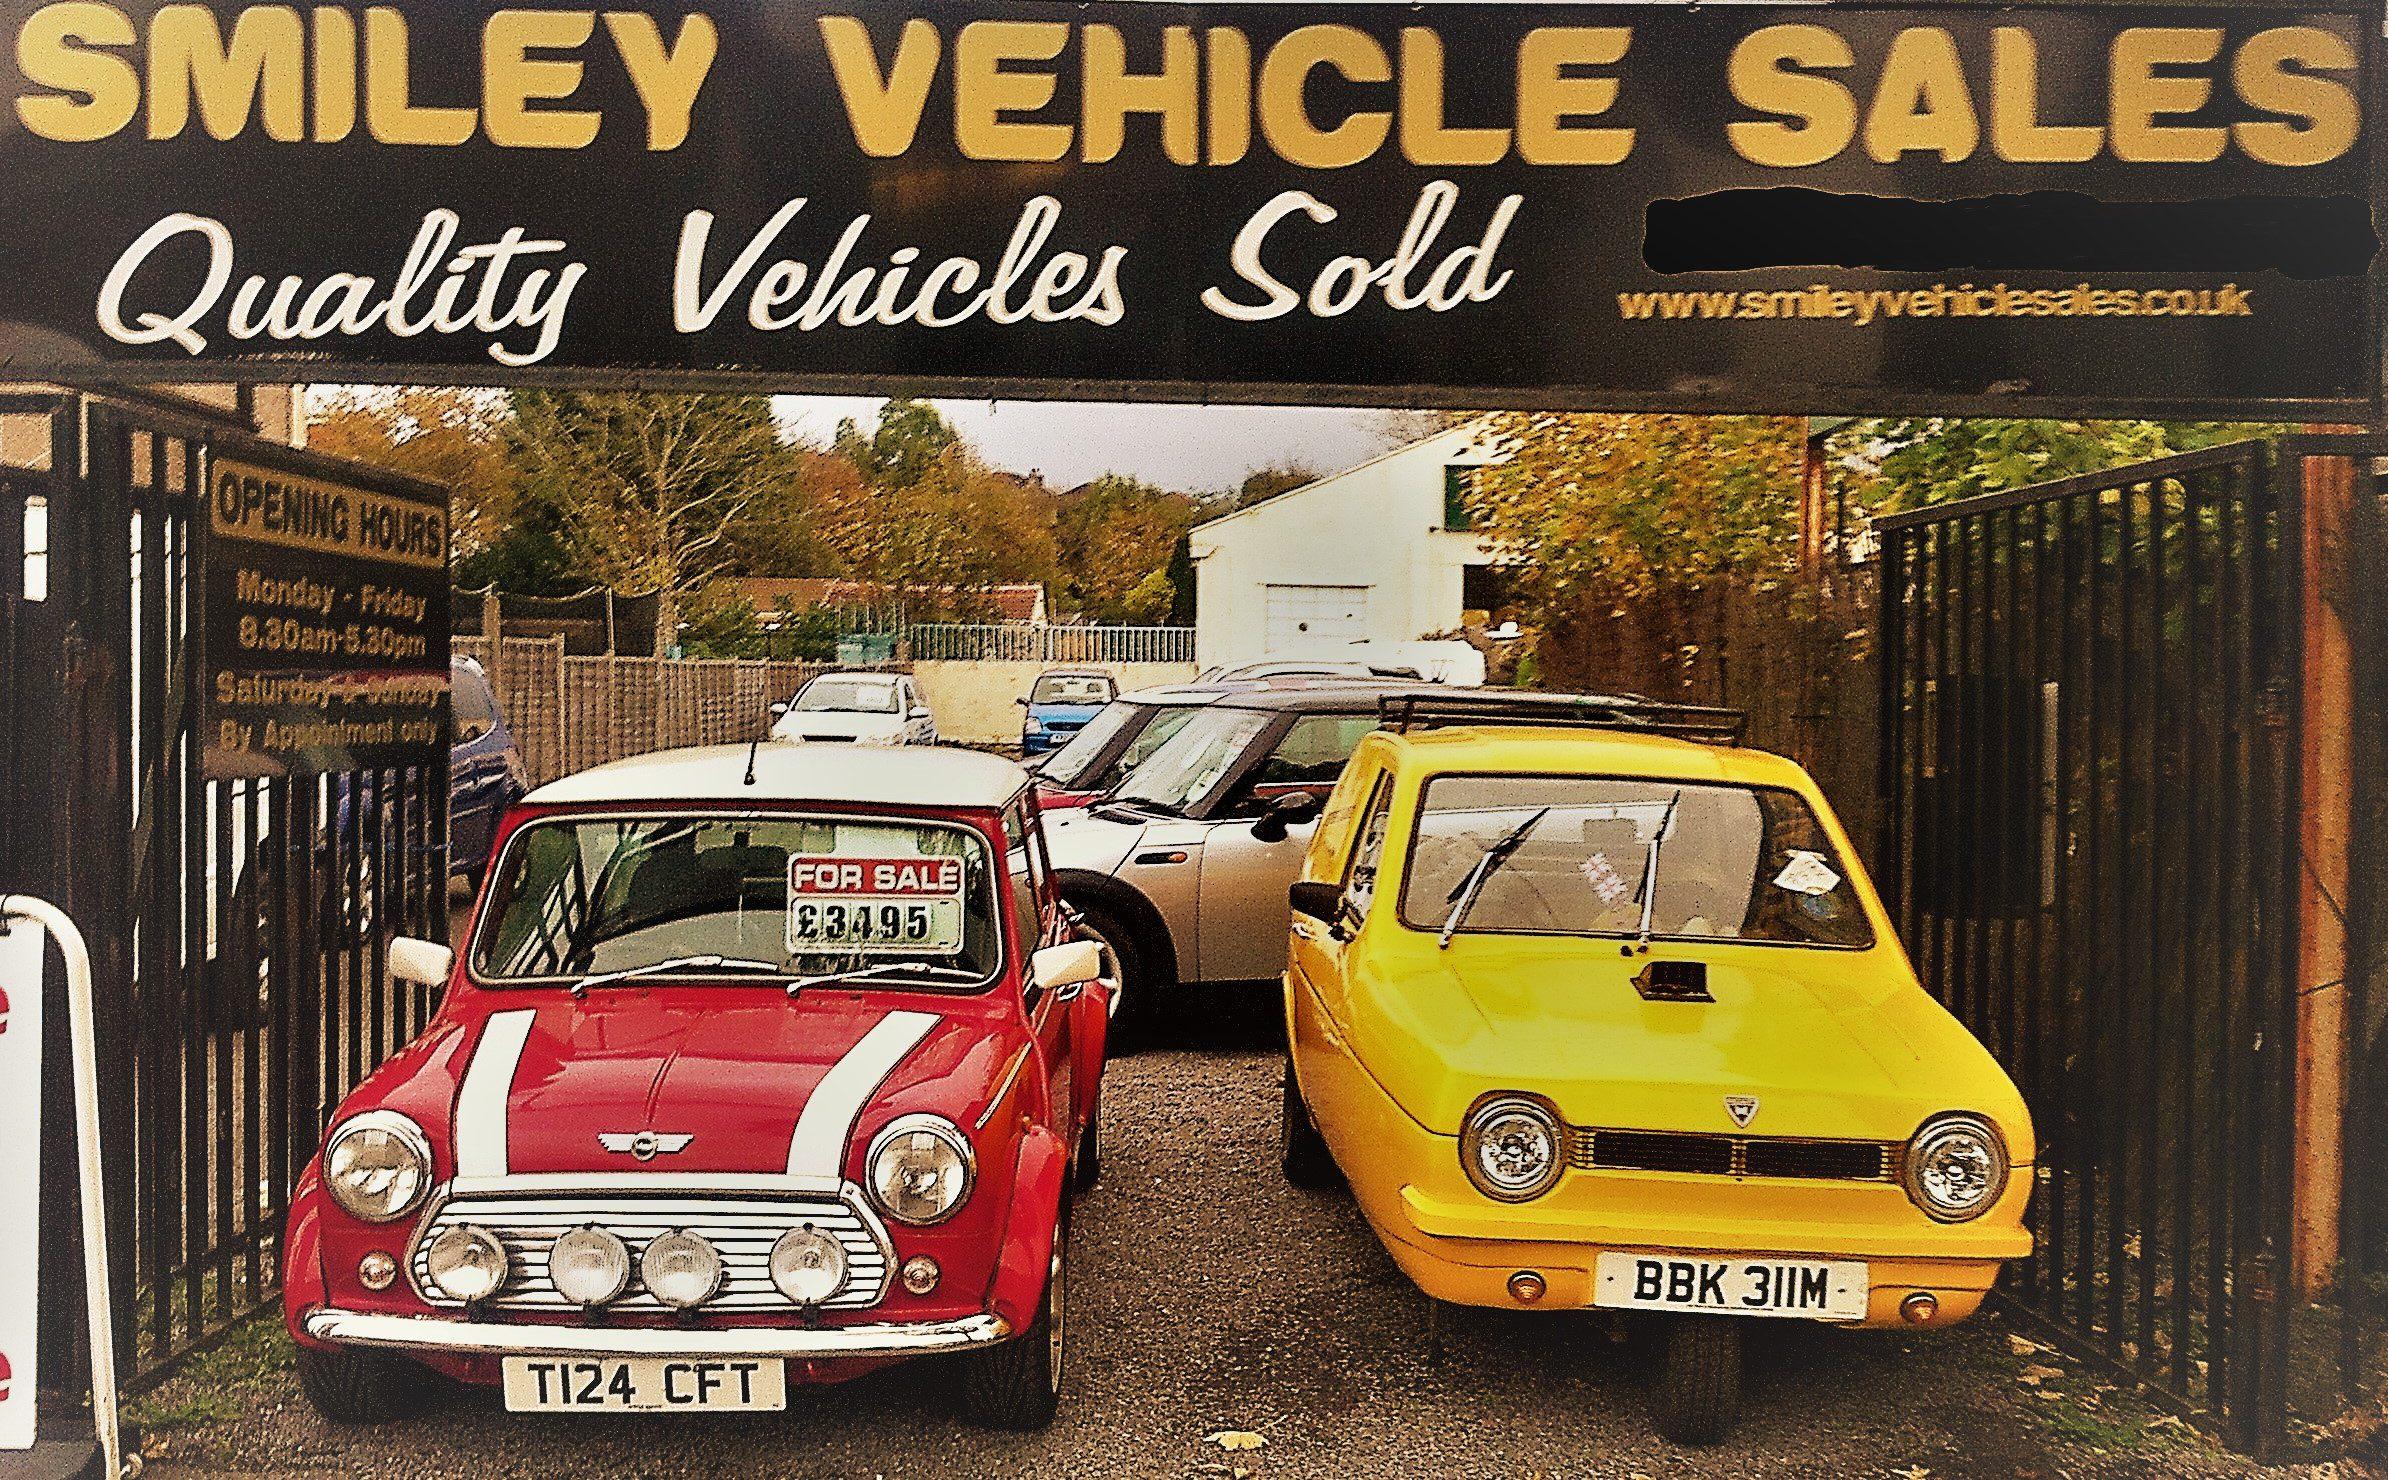 Smiley Vehicle Sales